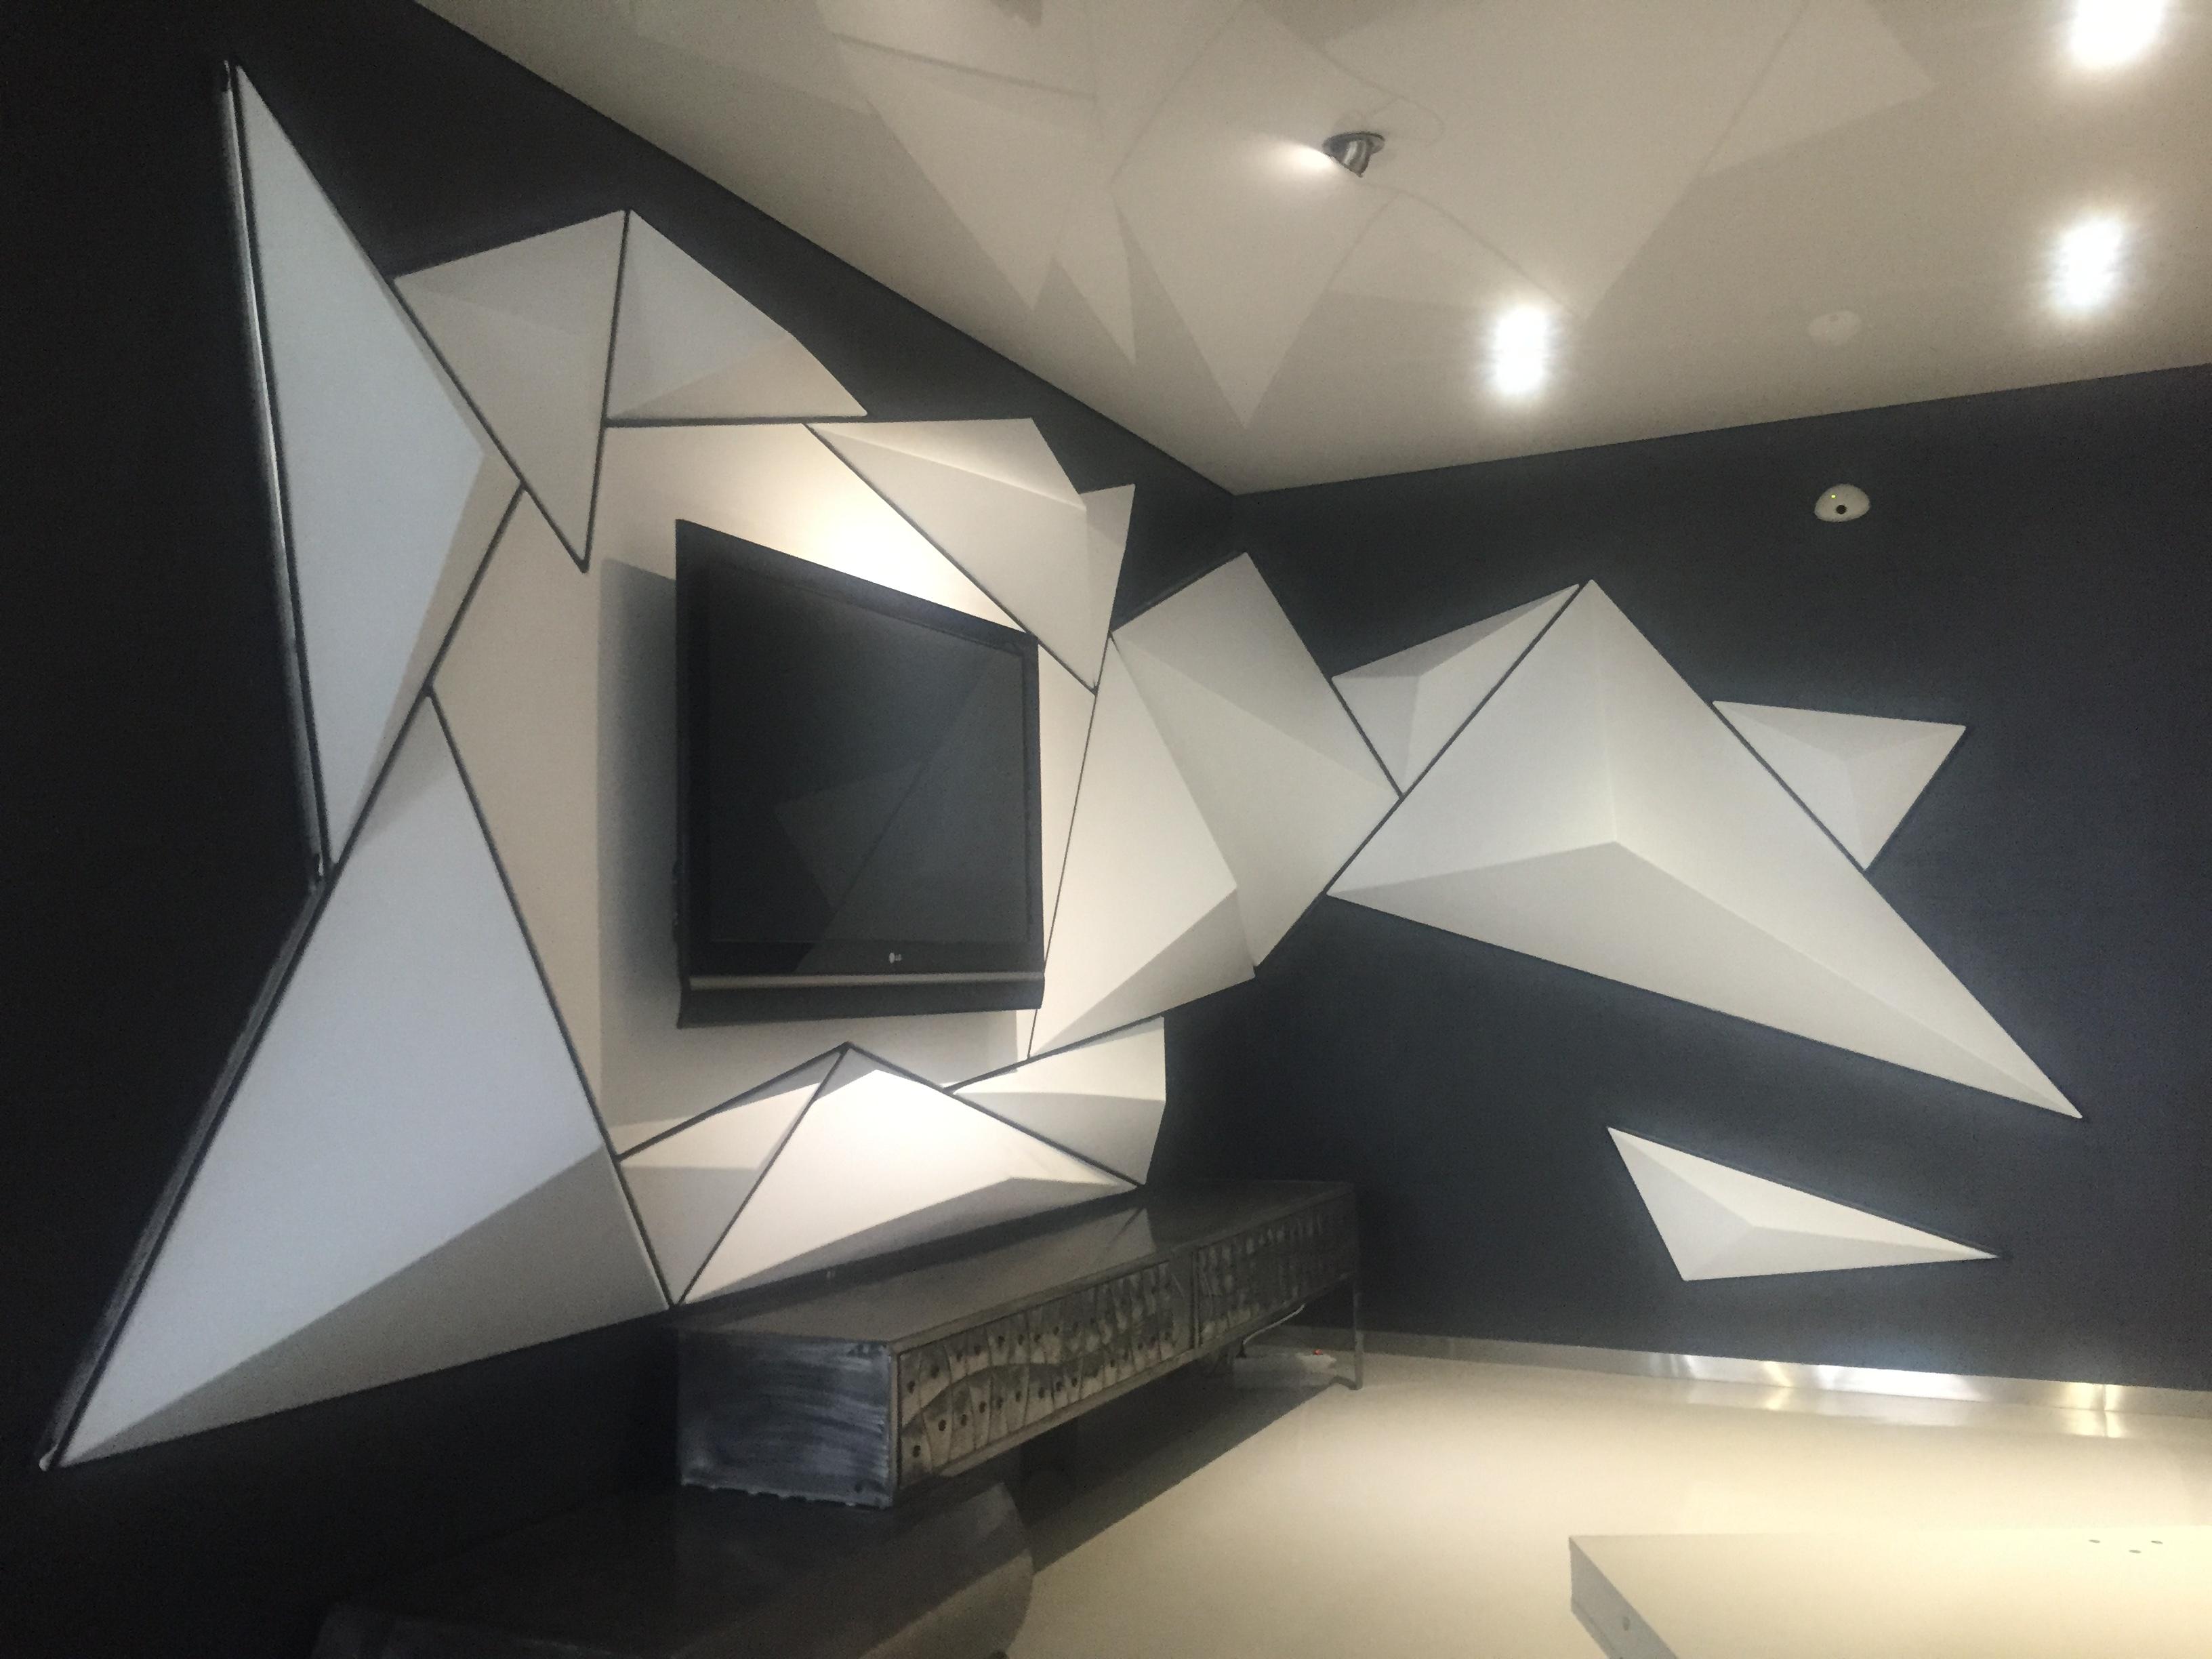 montauban plafond mur tendu extenzo en 3d by steeve mieulet. Black Bedroom Furniture Sets. Home Design Ideas